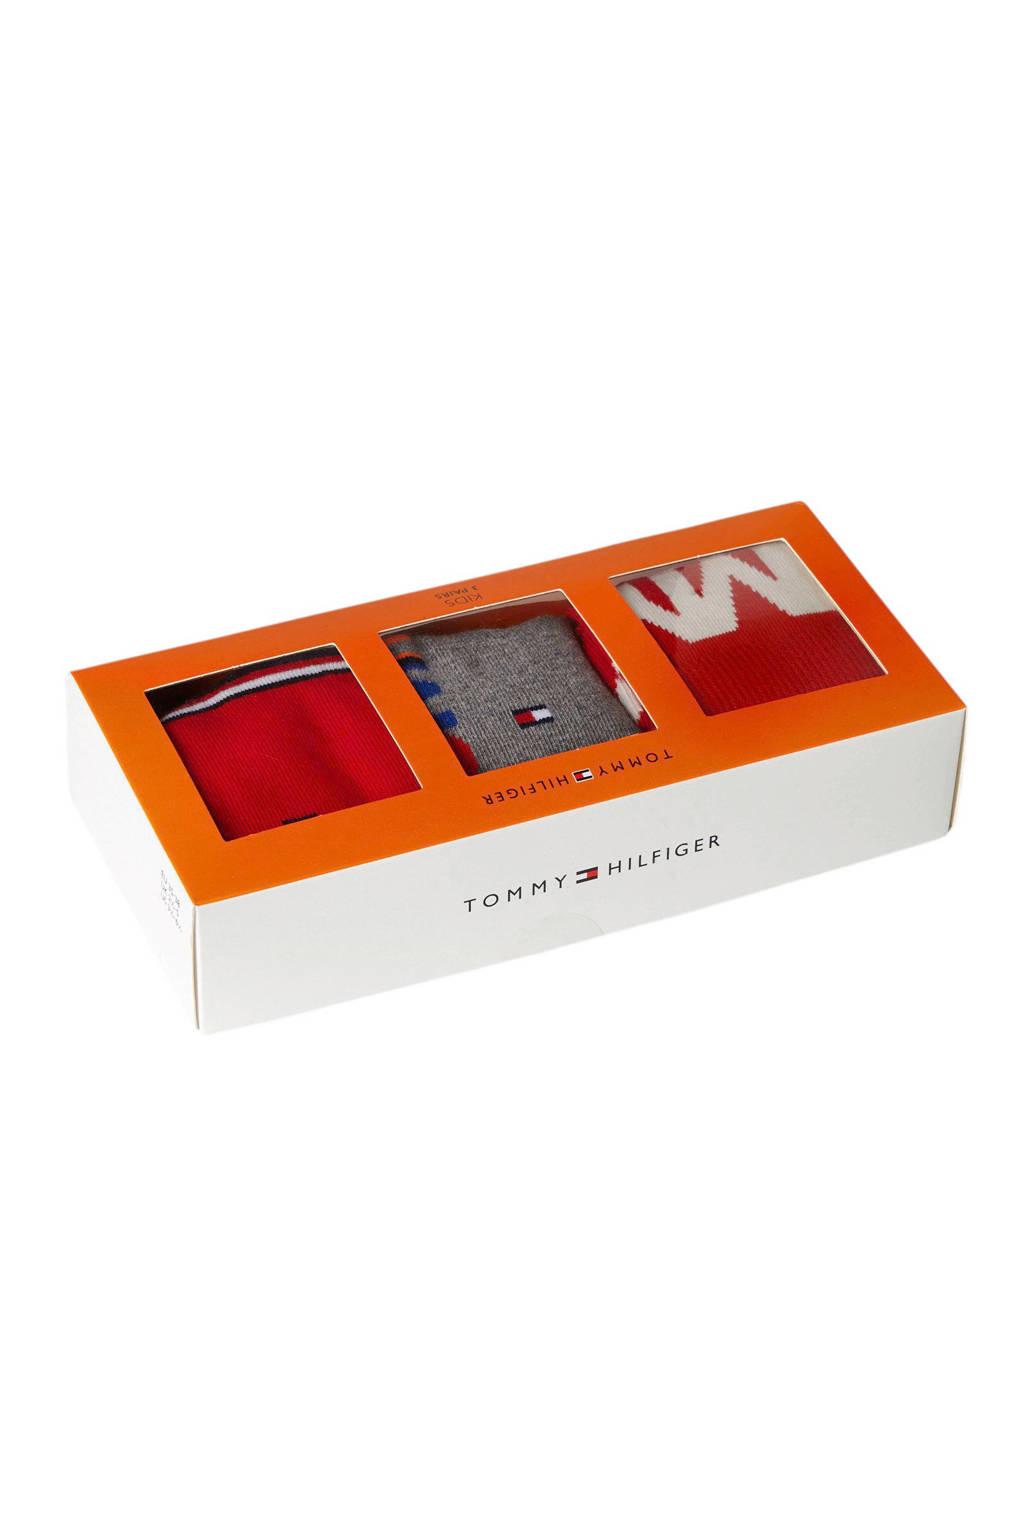 Tommy Hilfiger giftbox sokken ( 3 paar) rood, Rood/oranje/grijs/wit/blauw